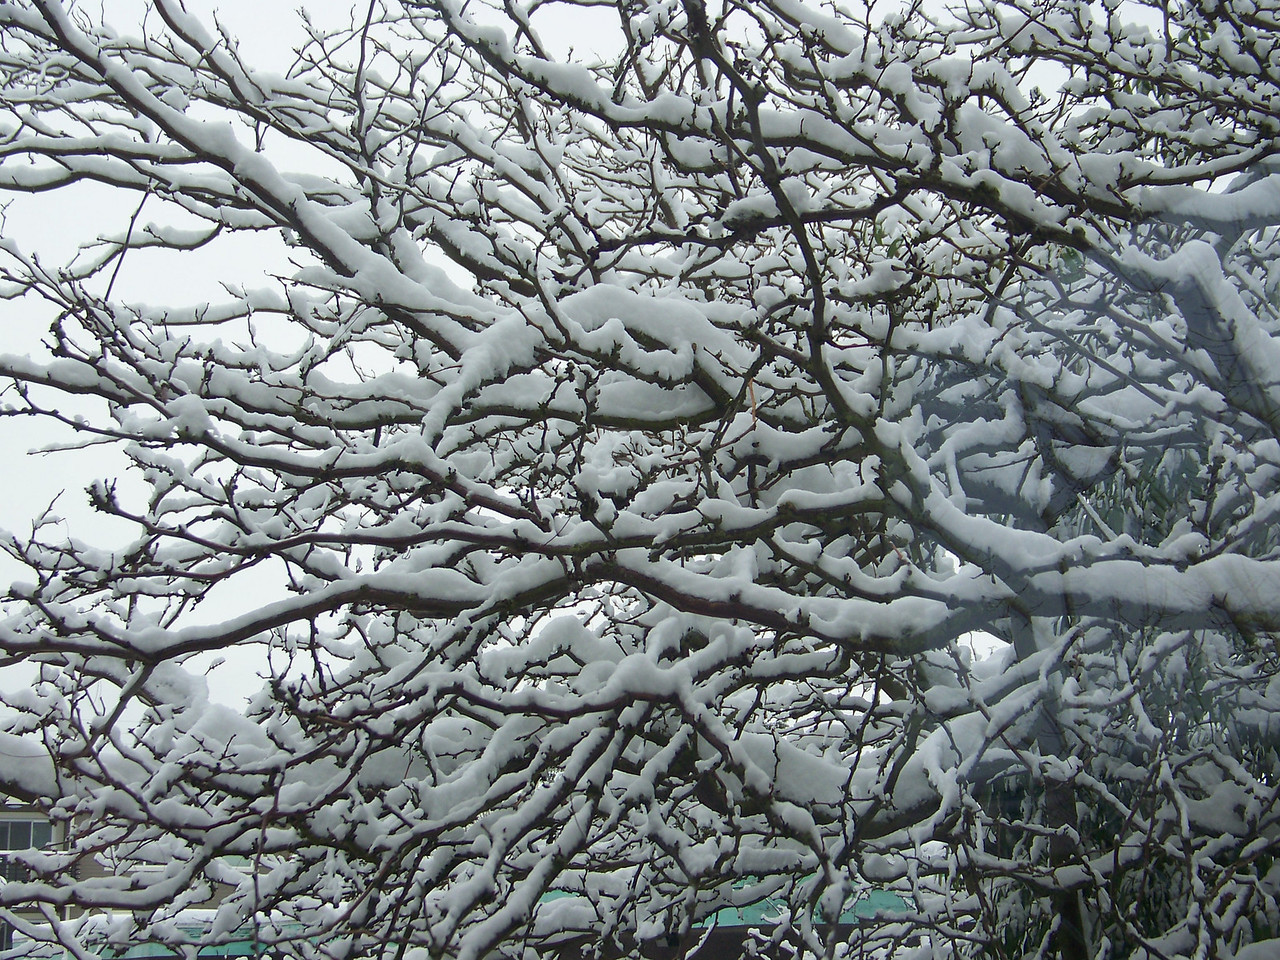 December 22, 2008.  The following day.  Even more snow has fallen!